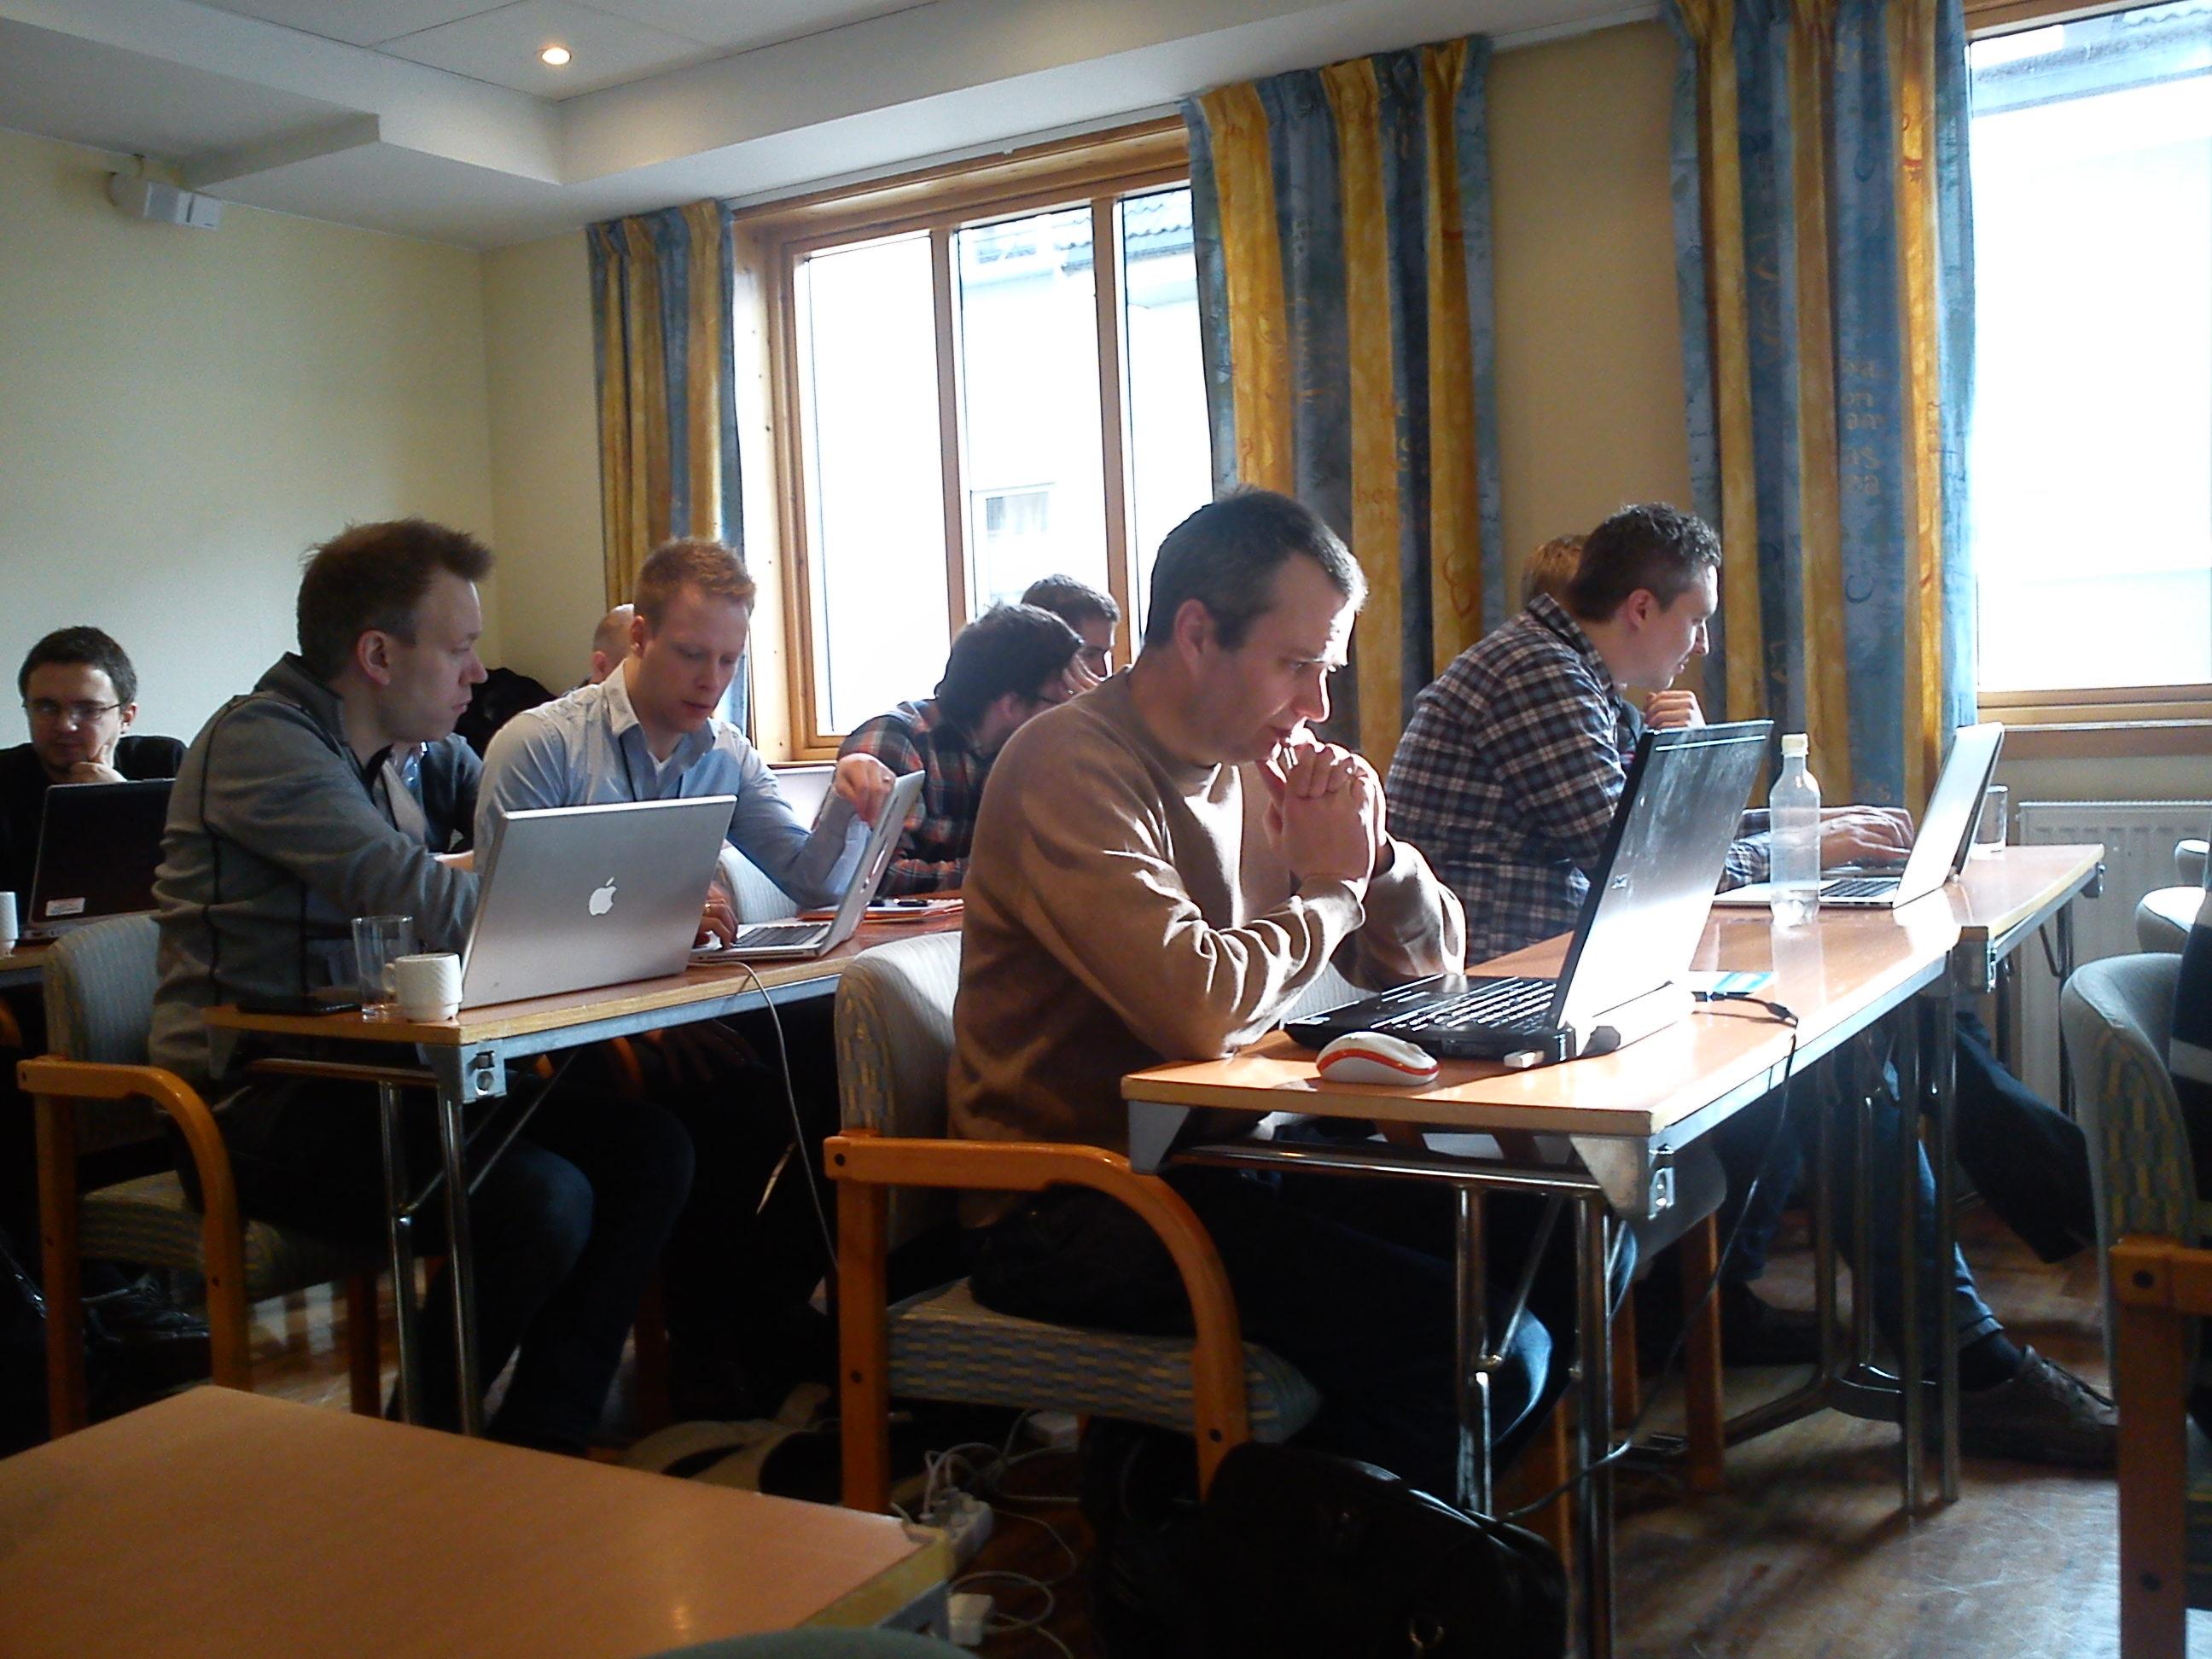 People solving a coding kata through pair programming